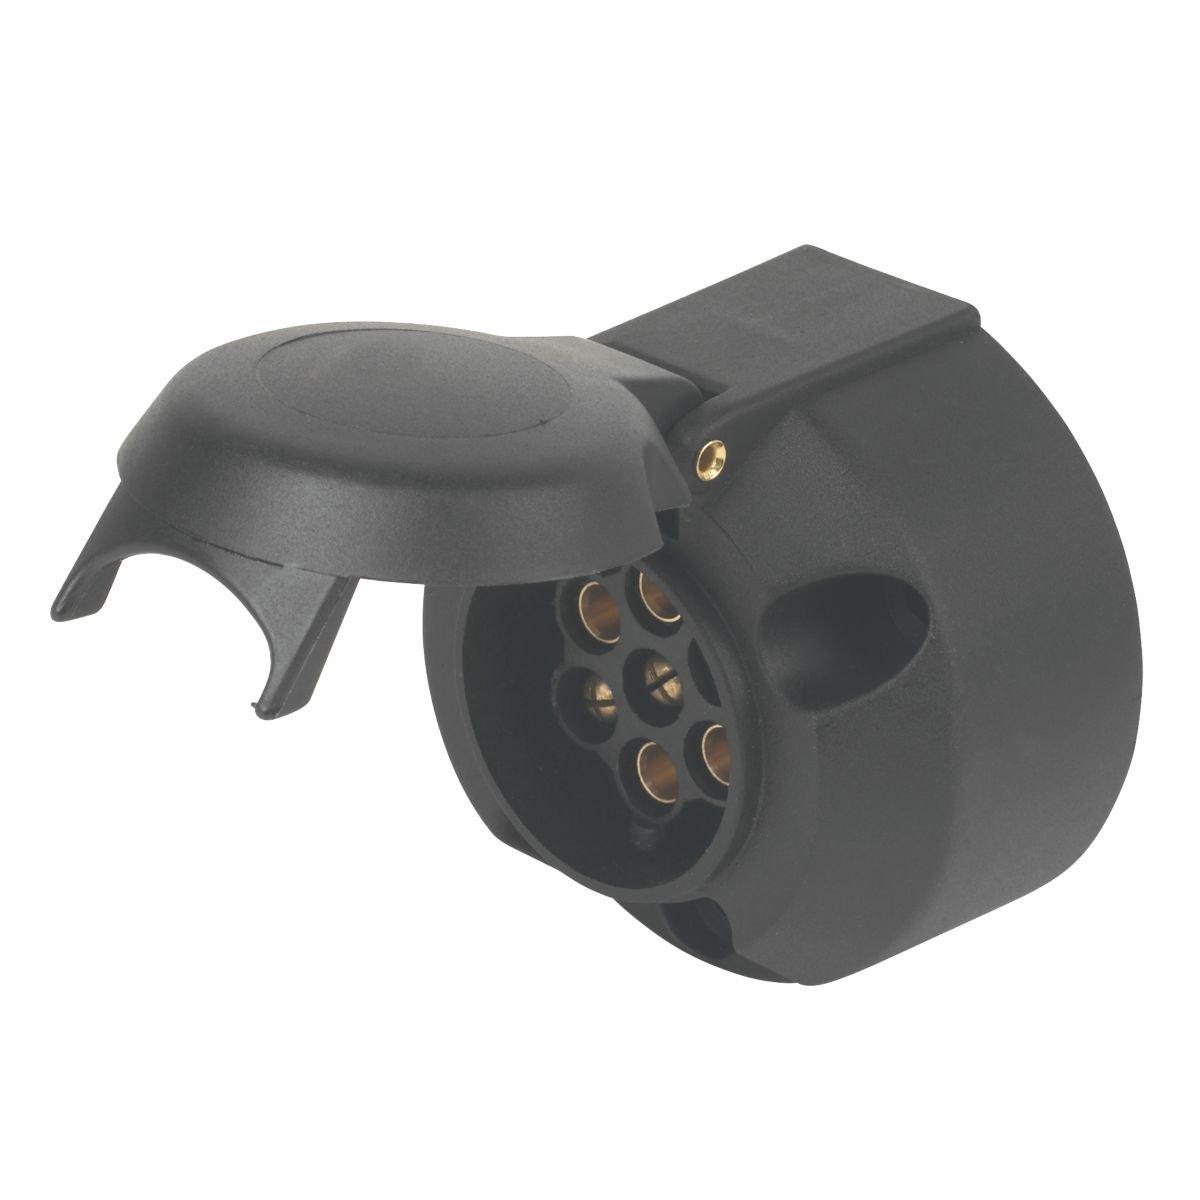 Maypole MP023 N-Type 7-Pin Trailer Board Socket 12V